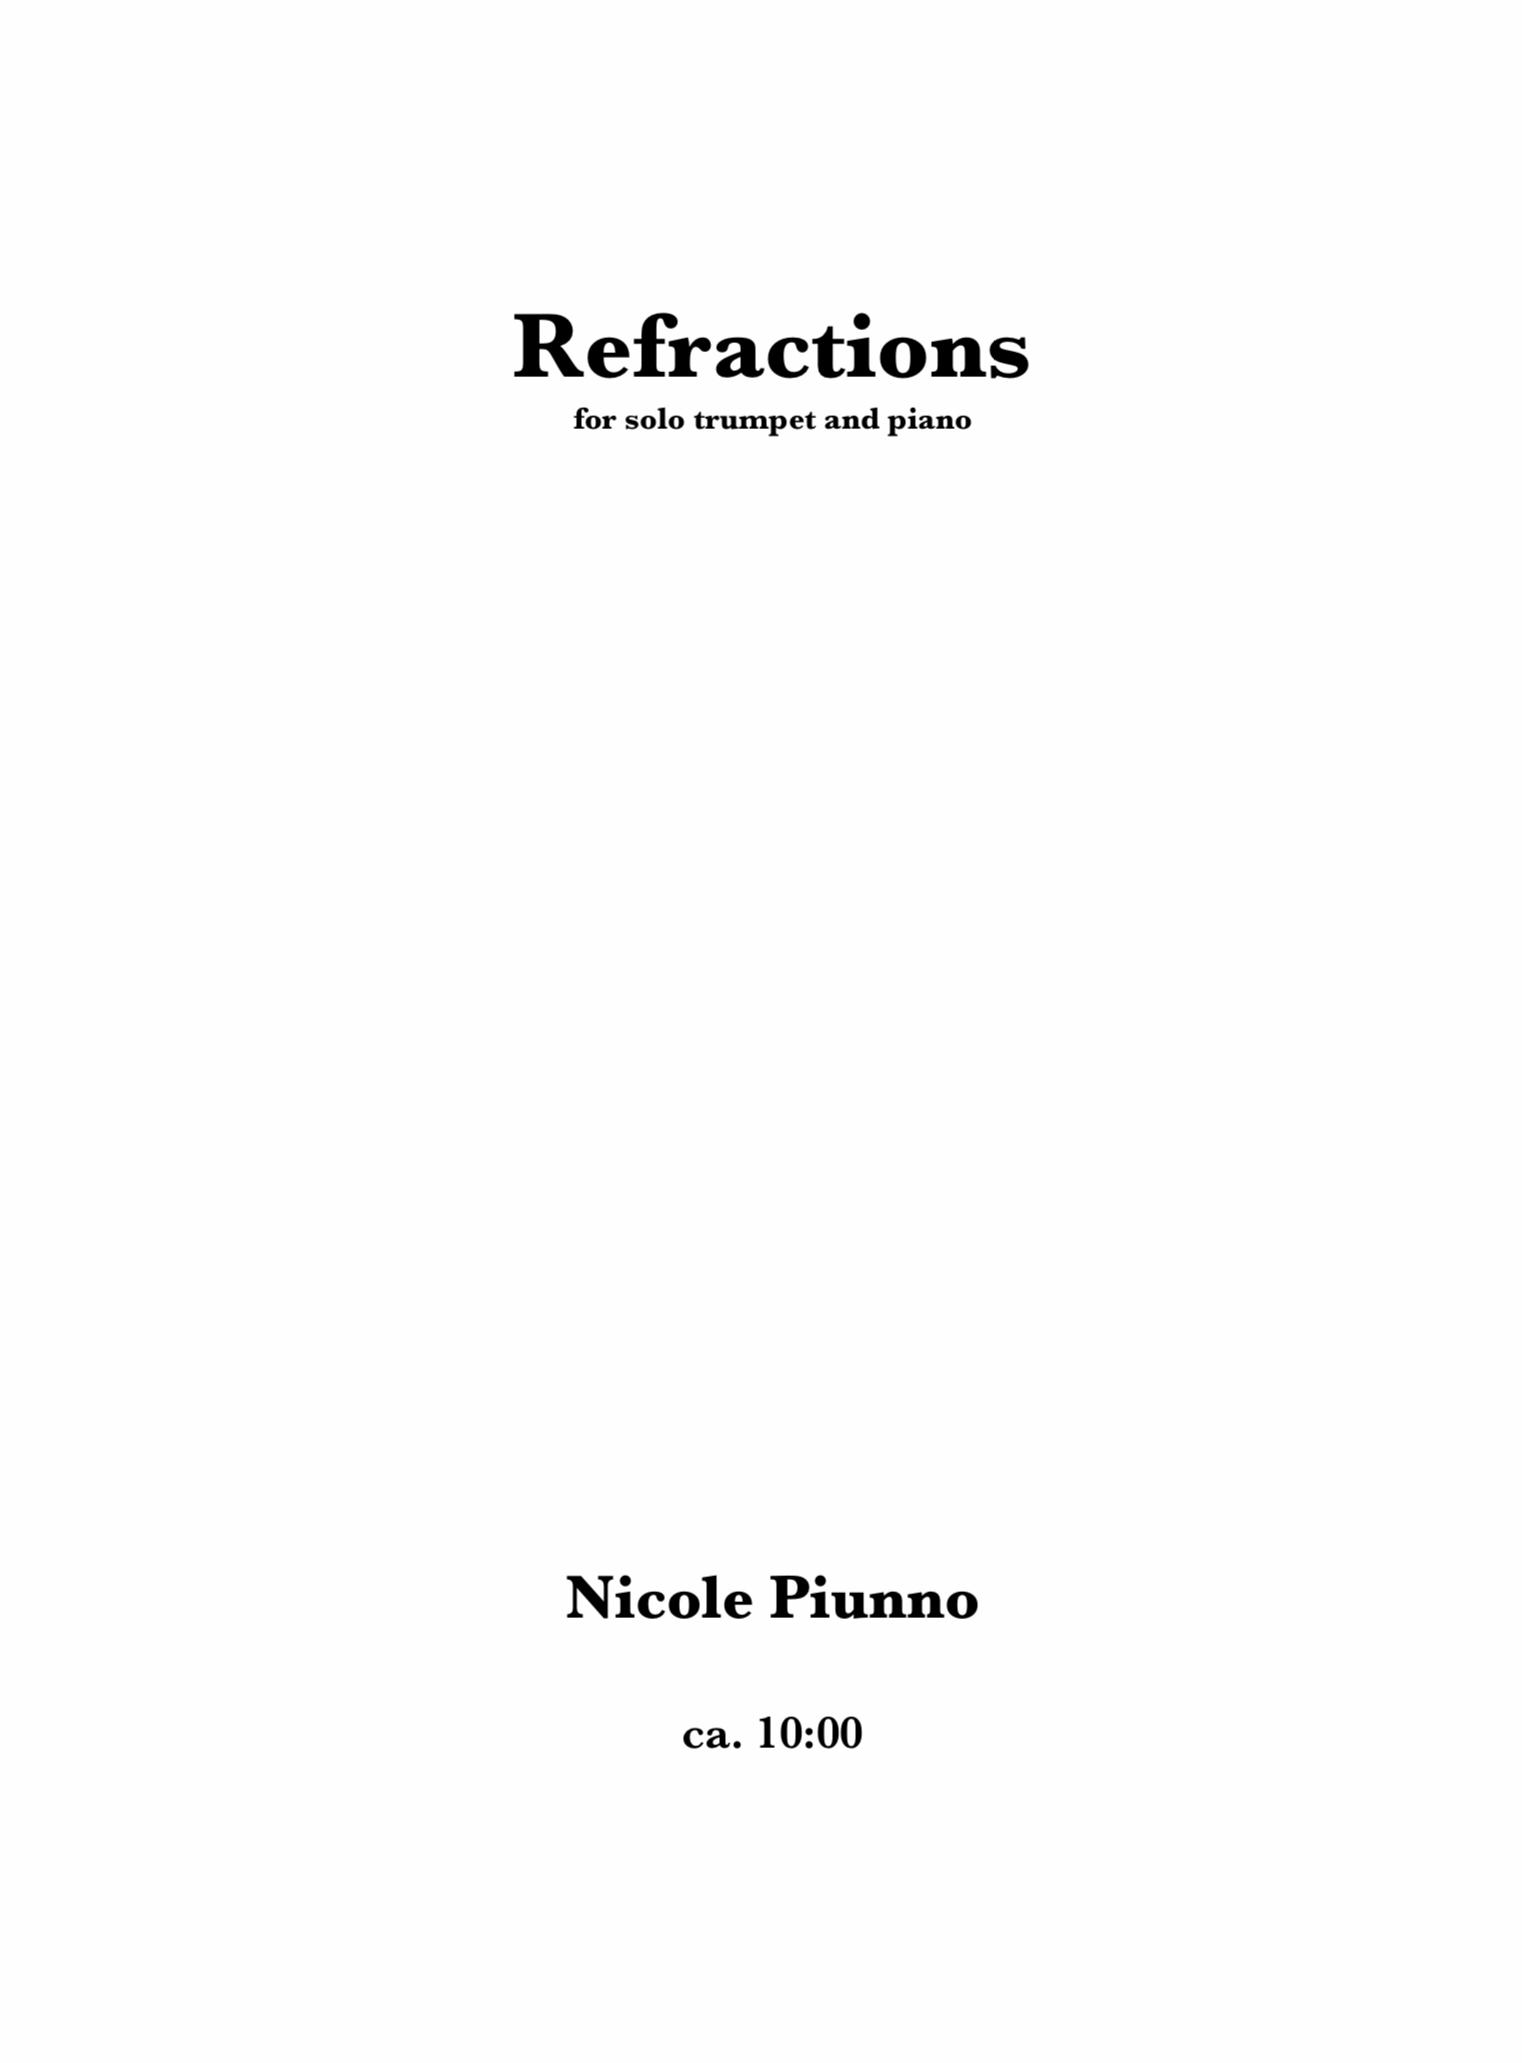 Refractions by Nicole Piunno